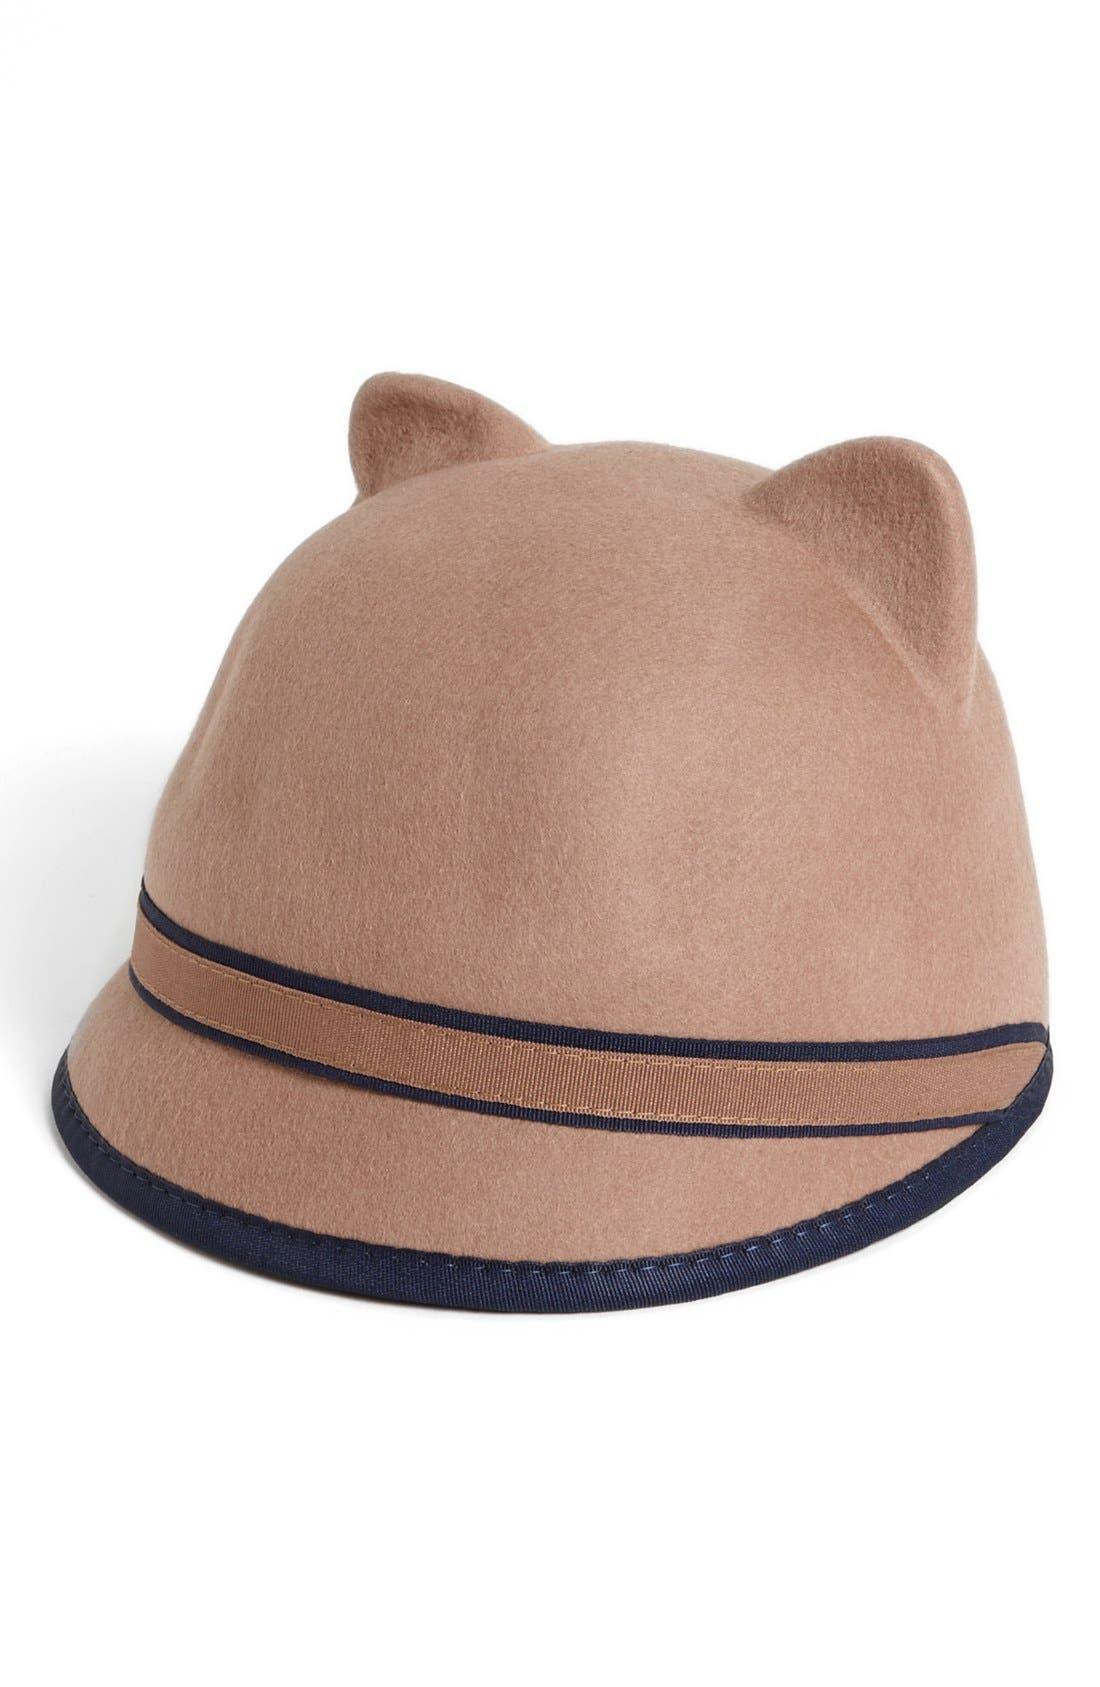 Main Image - BCBGMAXAZRIA Kitty Cat Baseball Cap